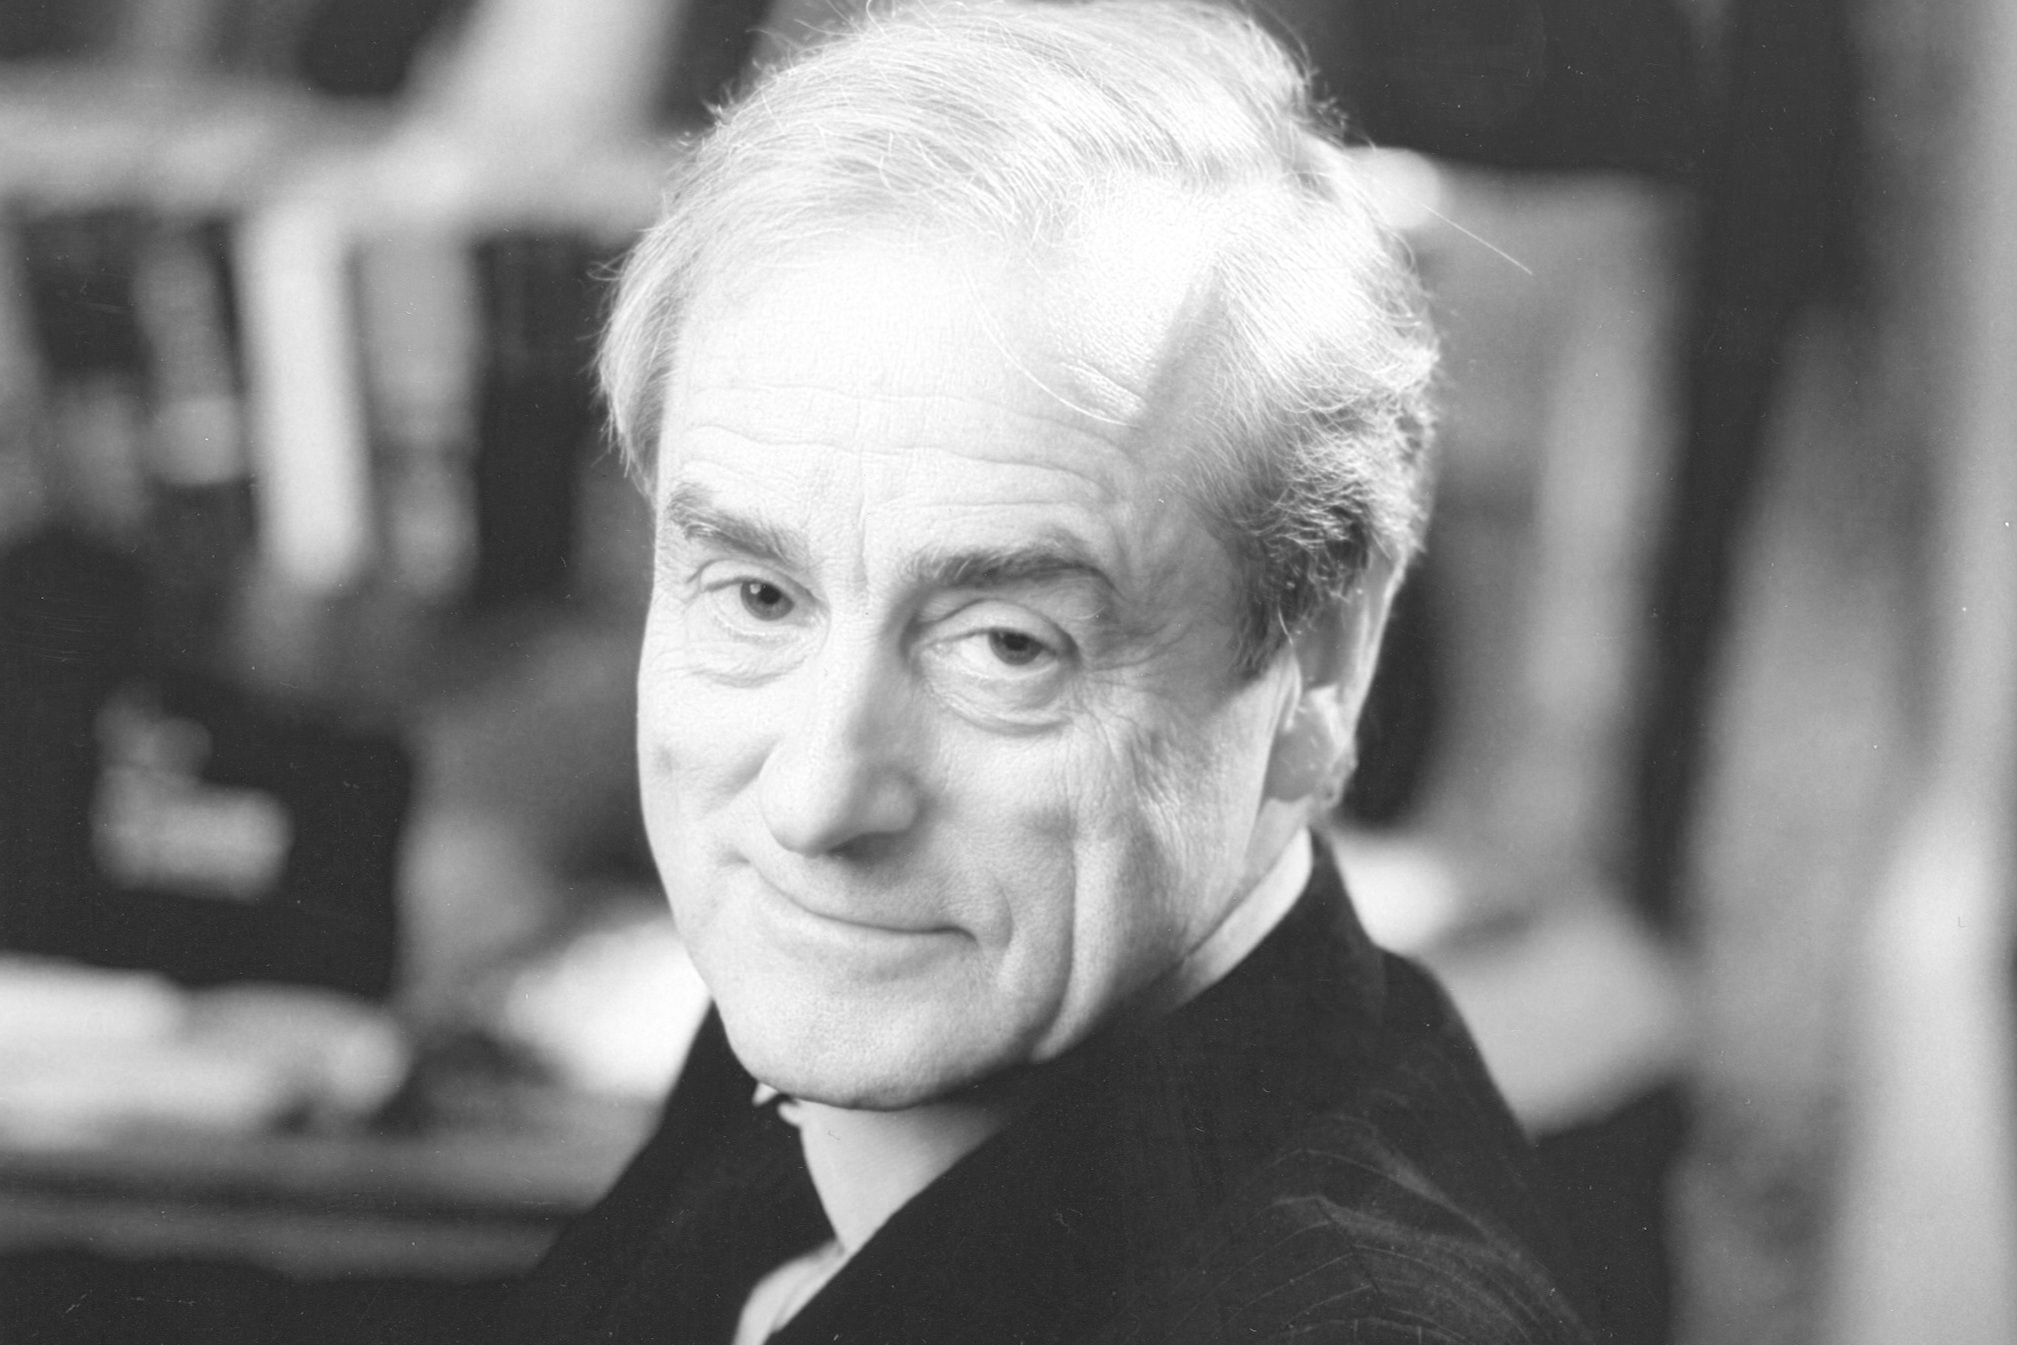 Sir Harold Evans - Editor, award-winning journalist